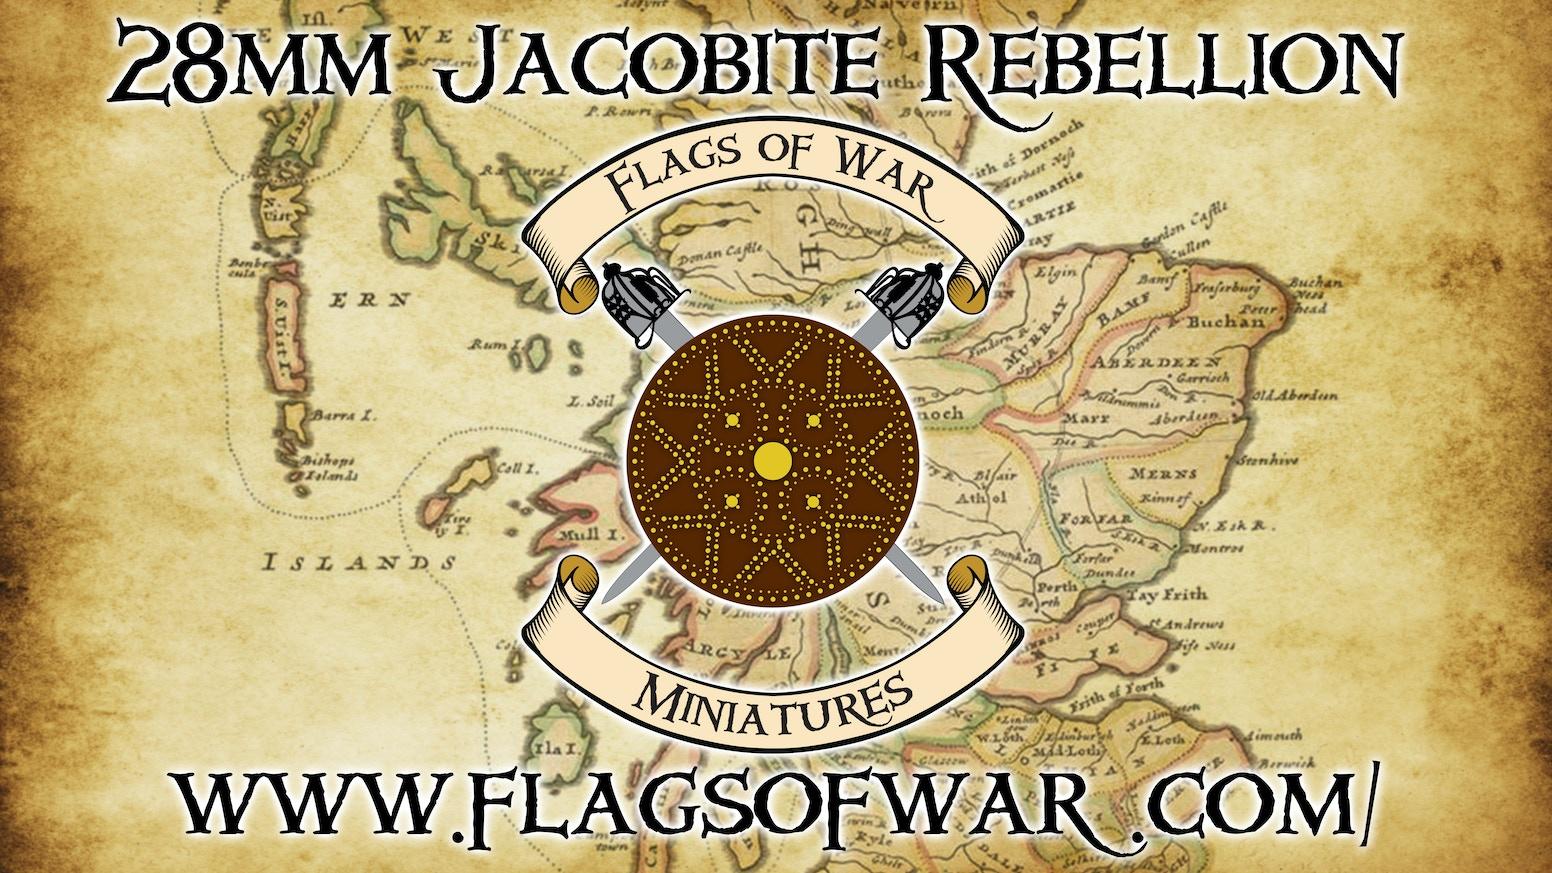 28mm 1745 Jacobite Rebellion Miniatures